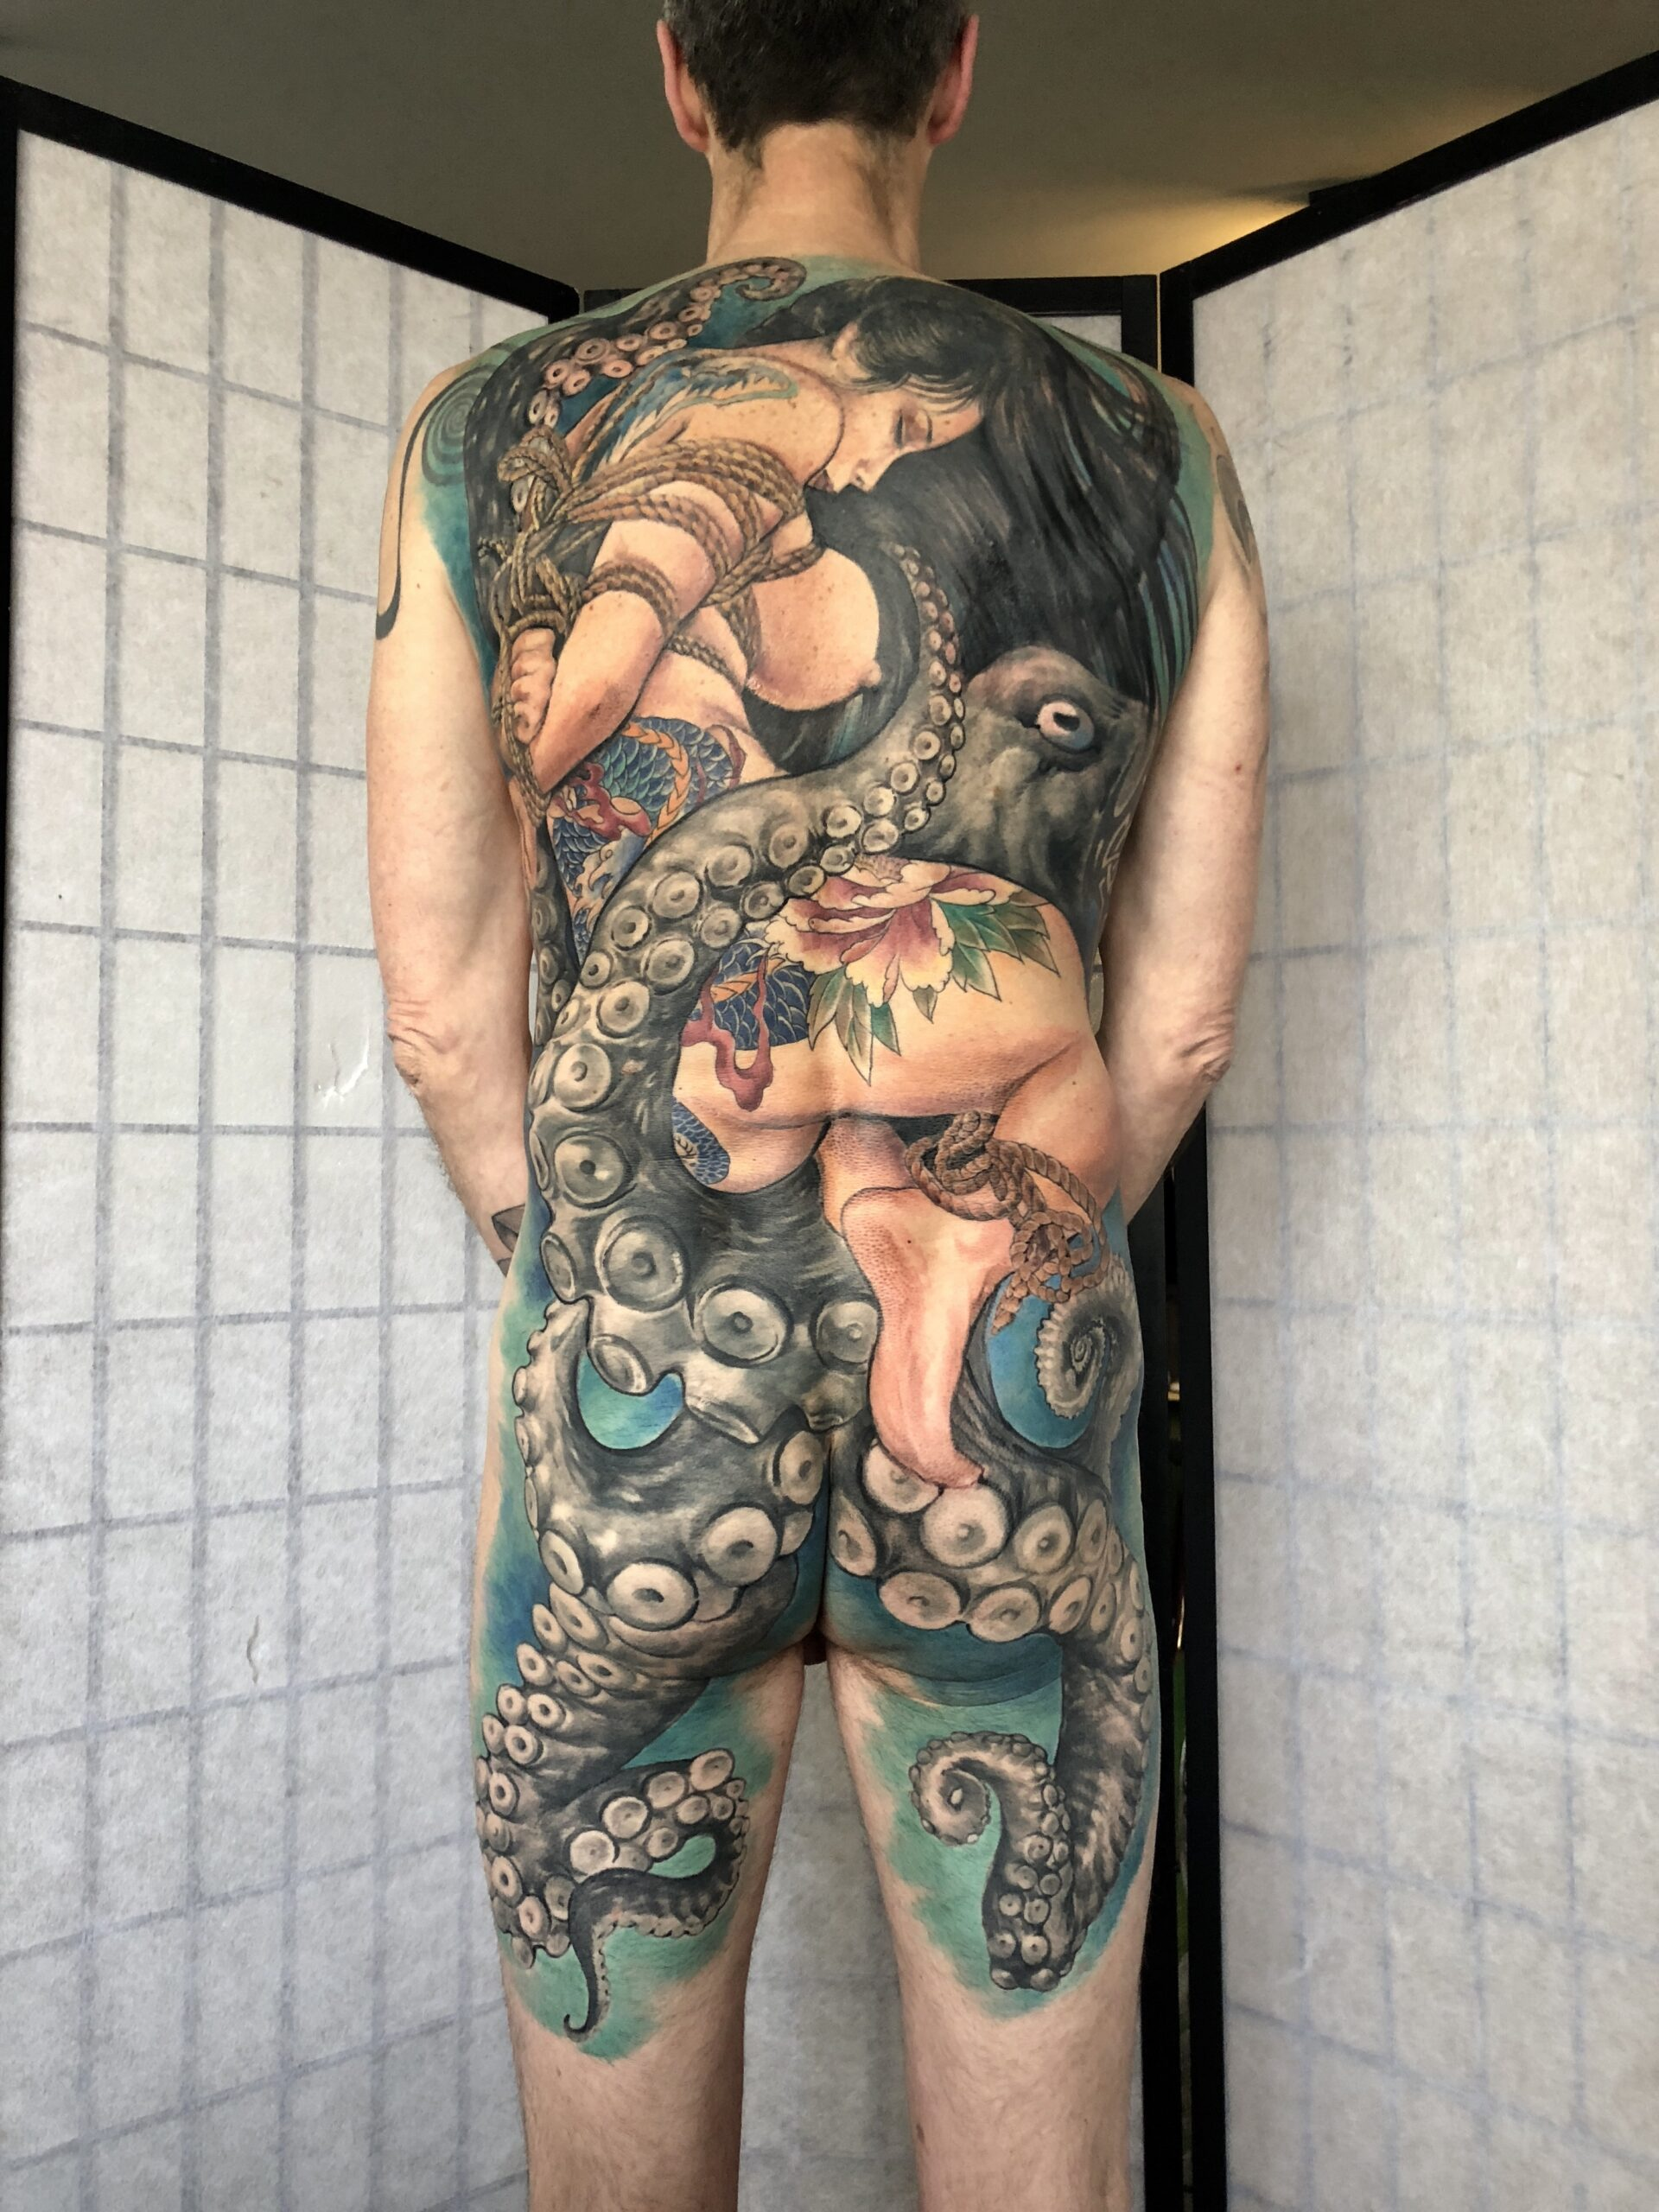 zhuo dan ting tattoo work 卓丹婷纹身作品 full back geisha 1